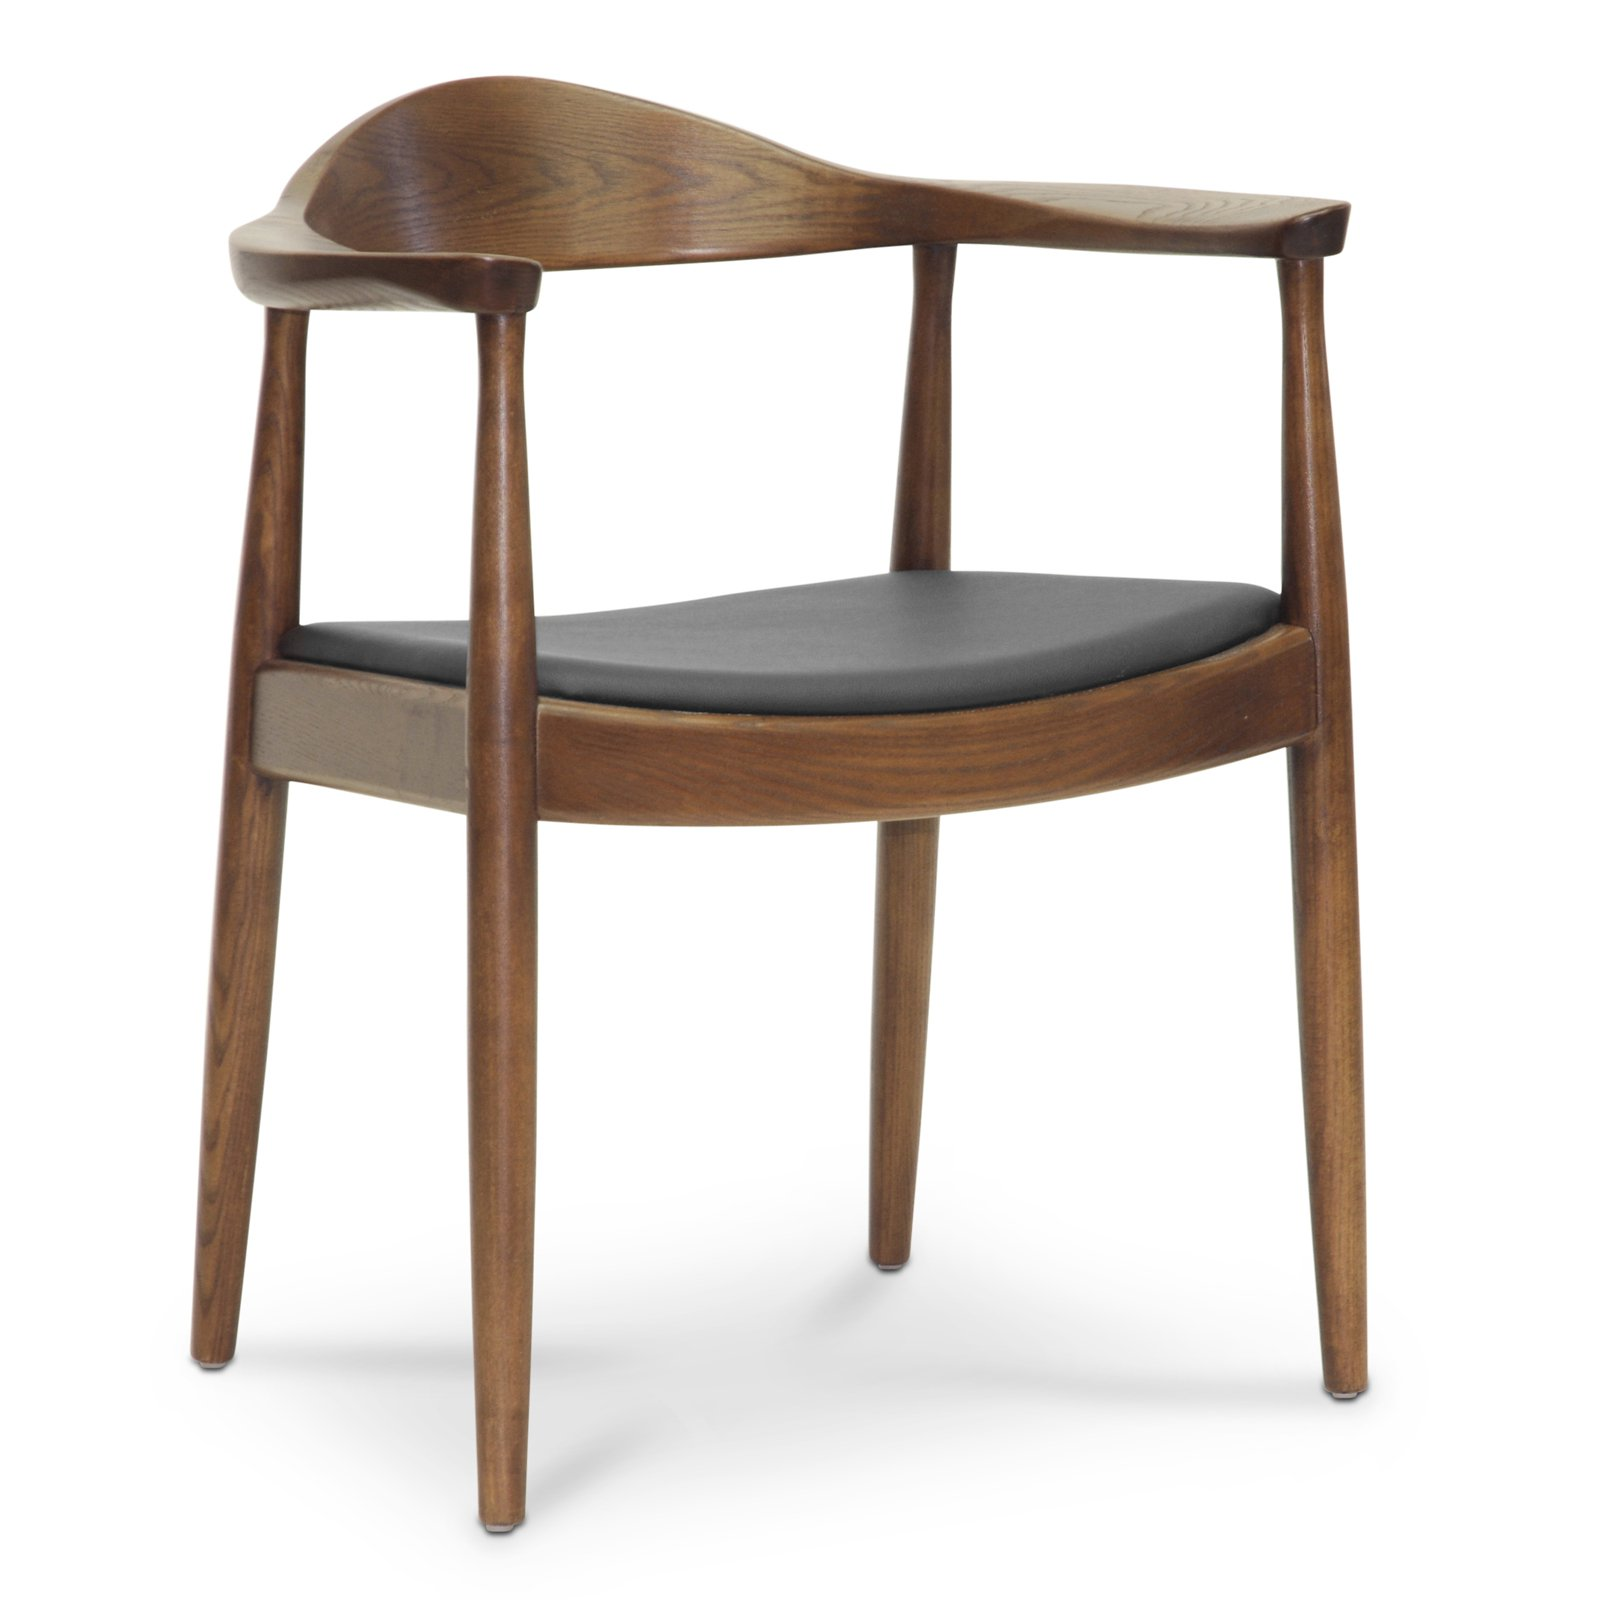 Baxton Studio Embick Dining Arm Chair - Dark Brown